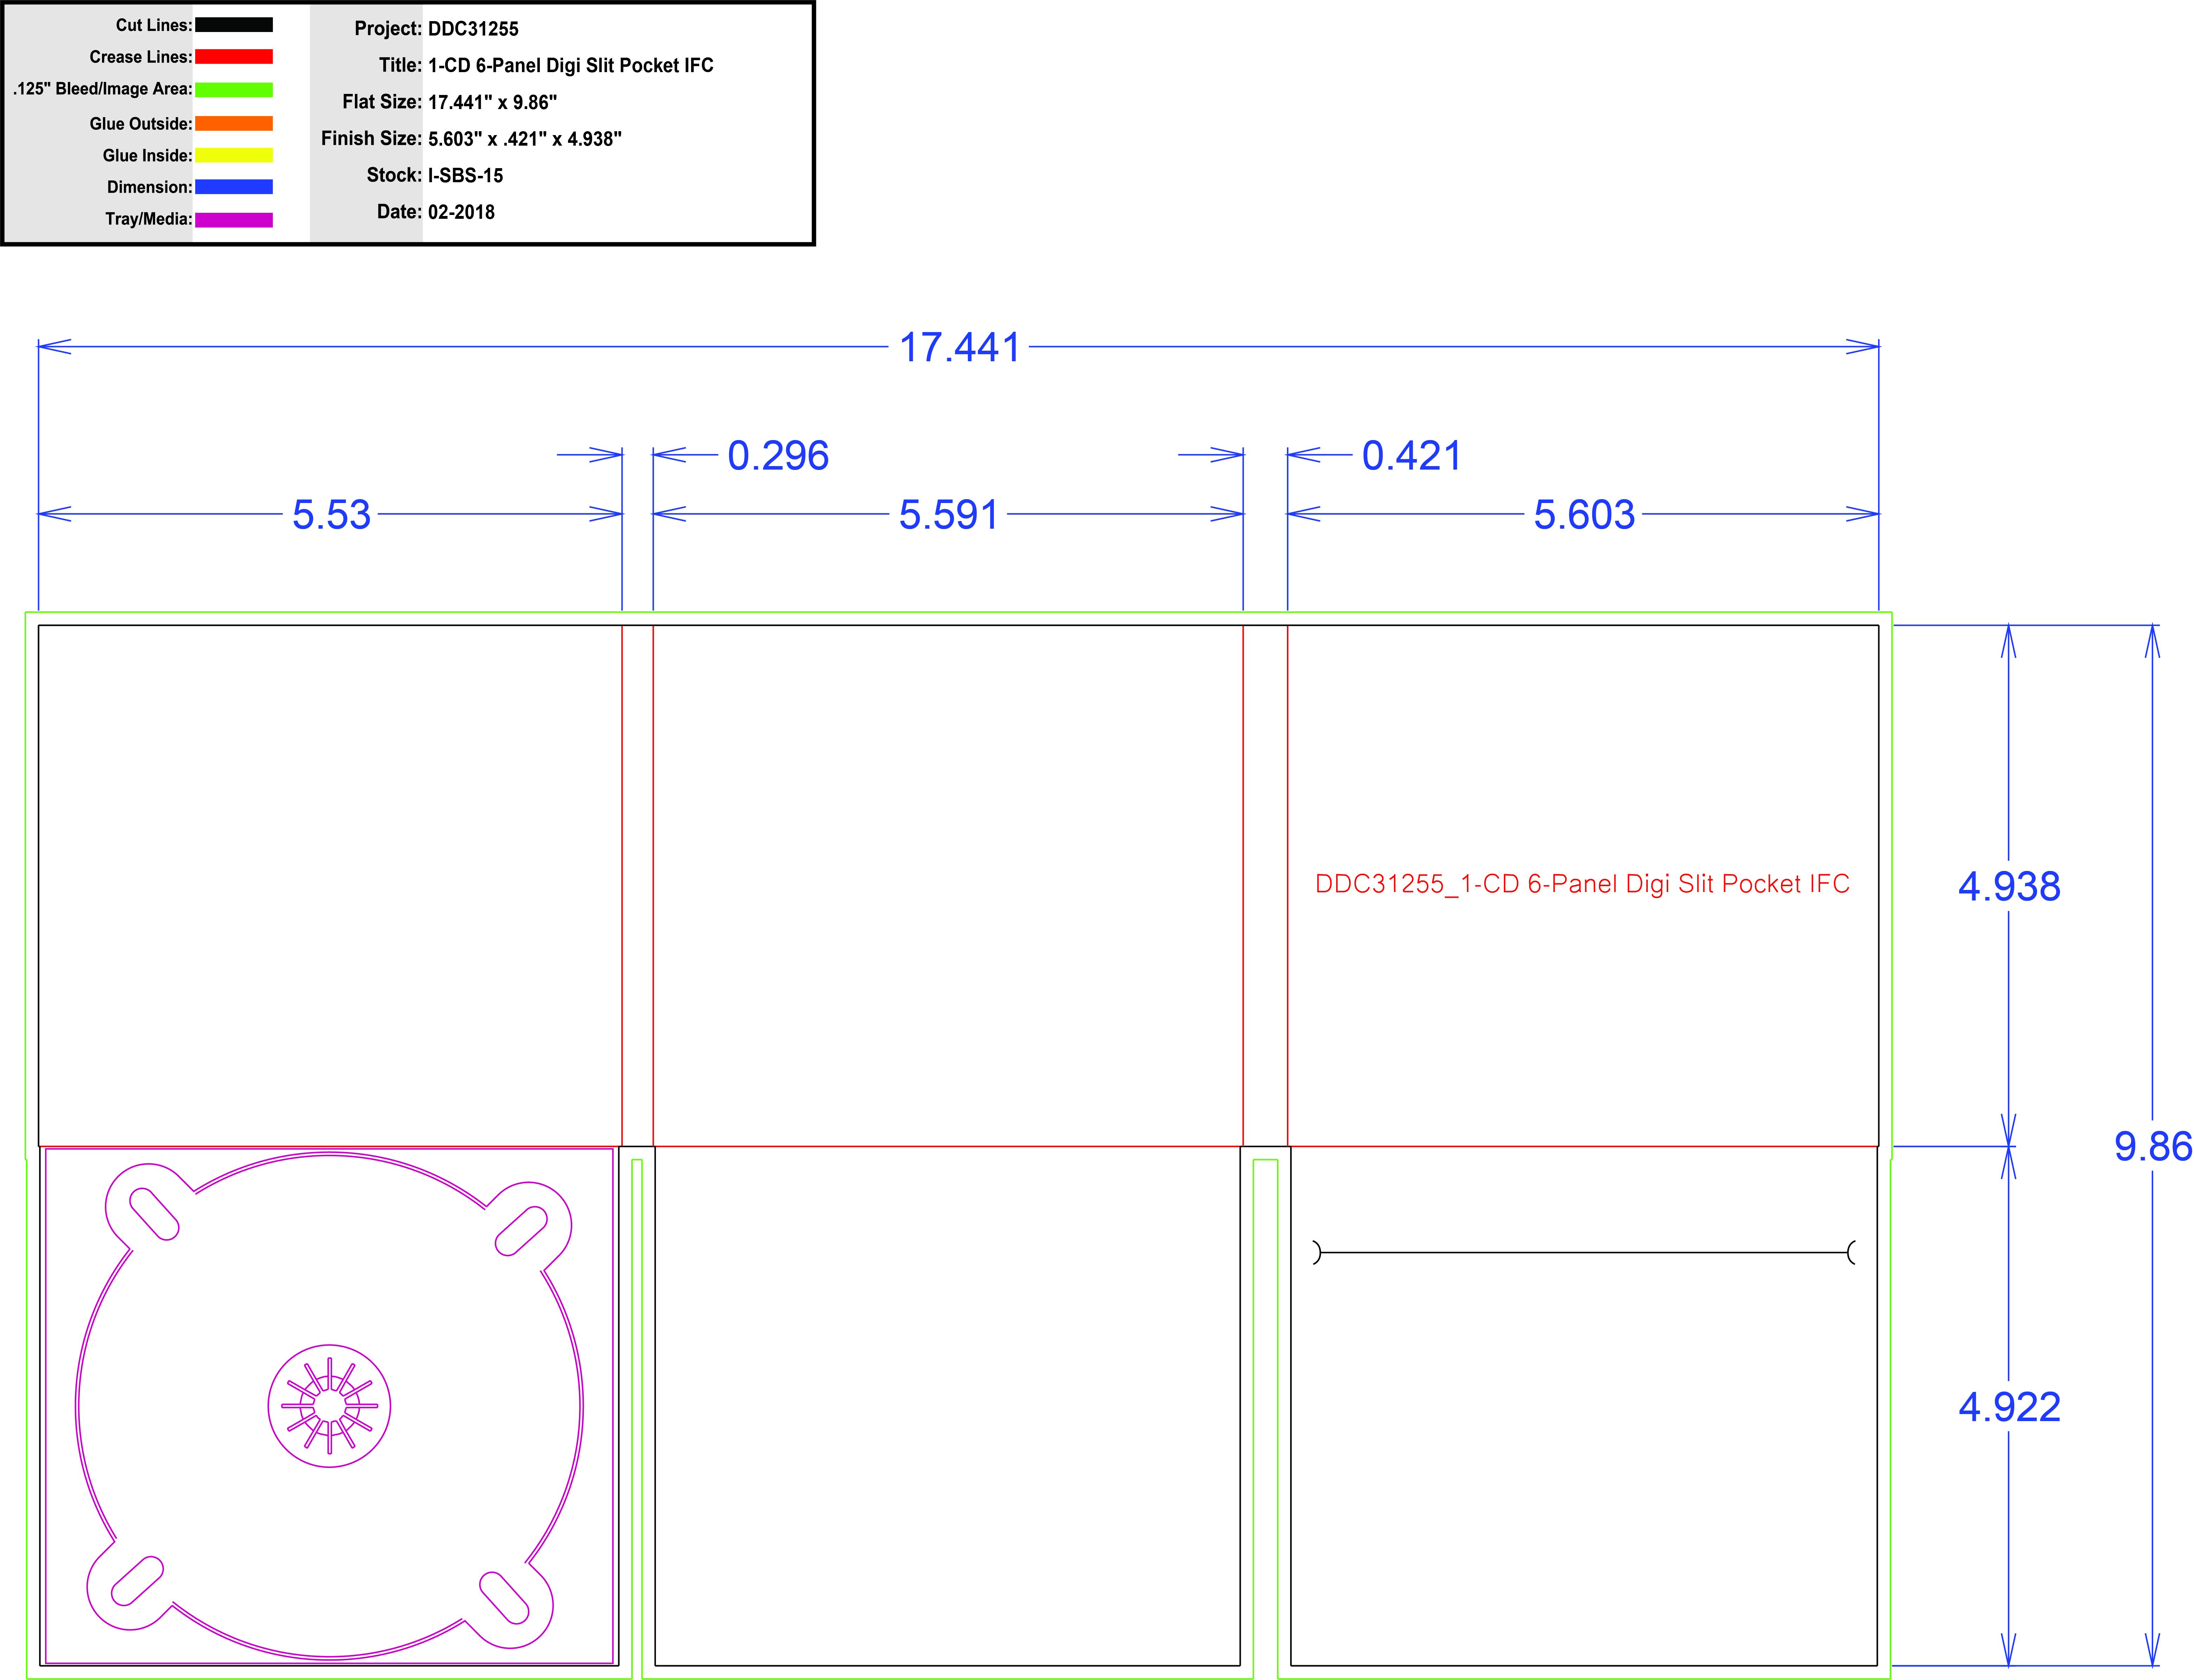 DDC31255 6 Panel Digi 1 Tray, Slit Pocket